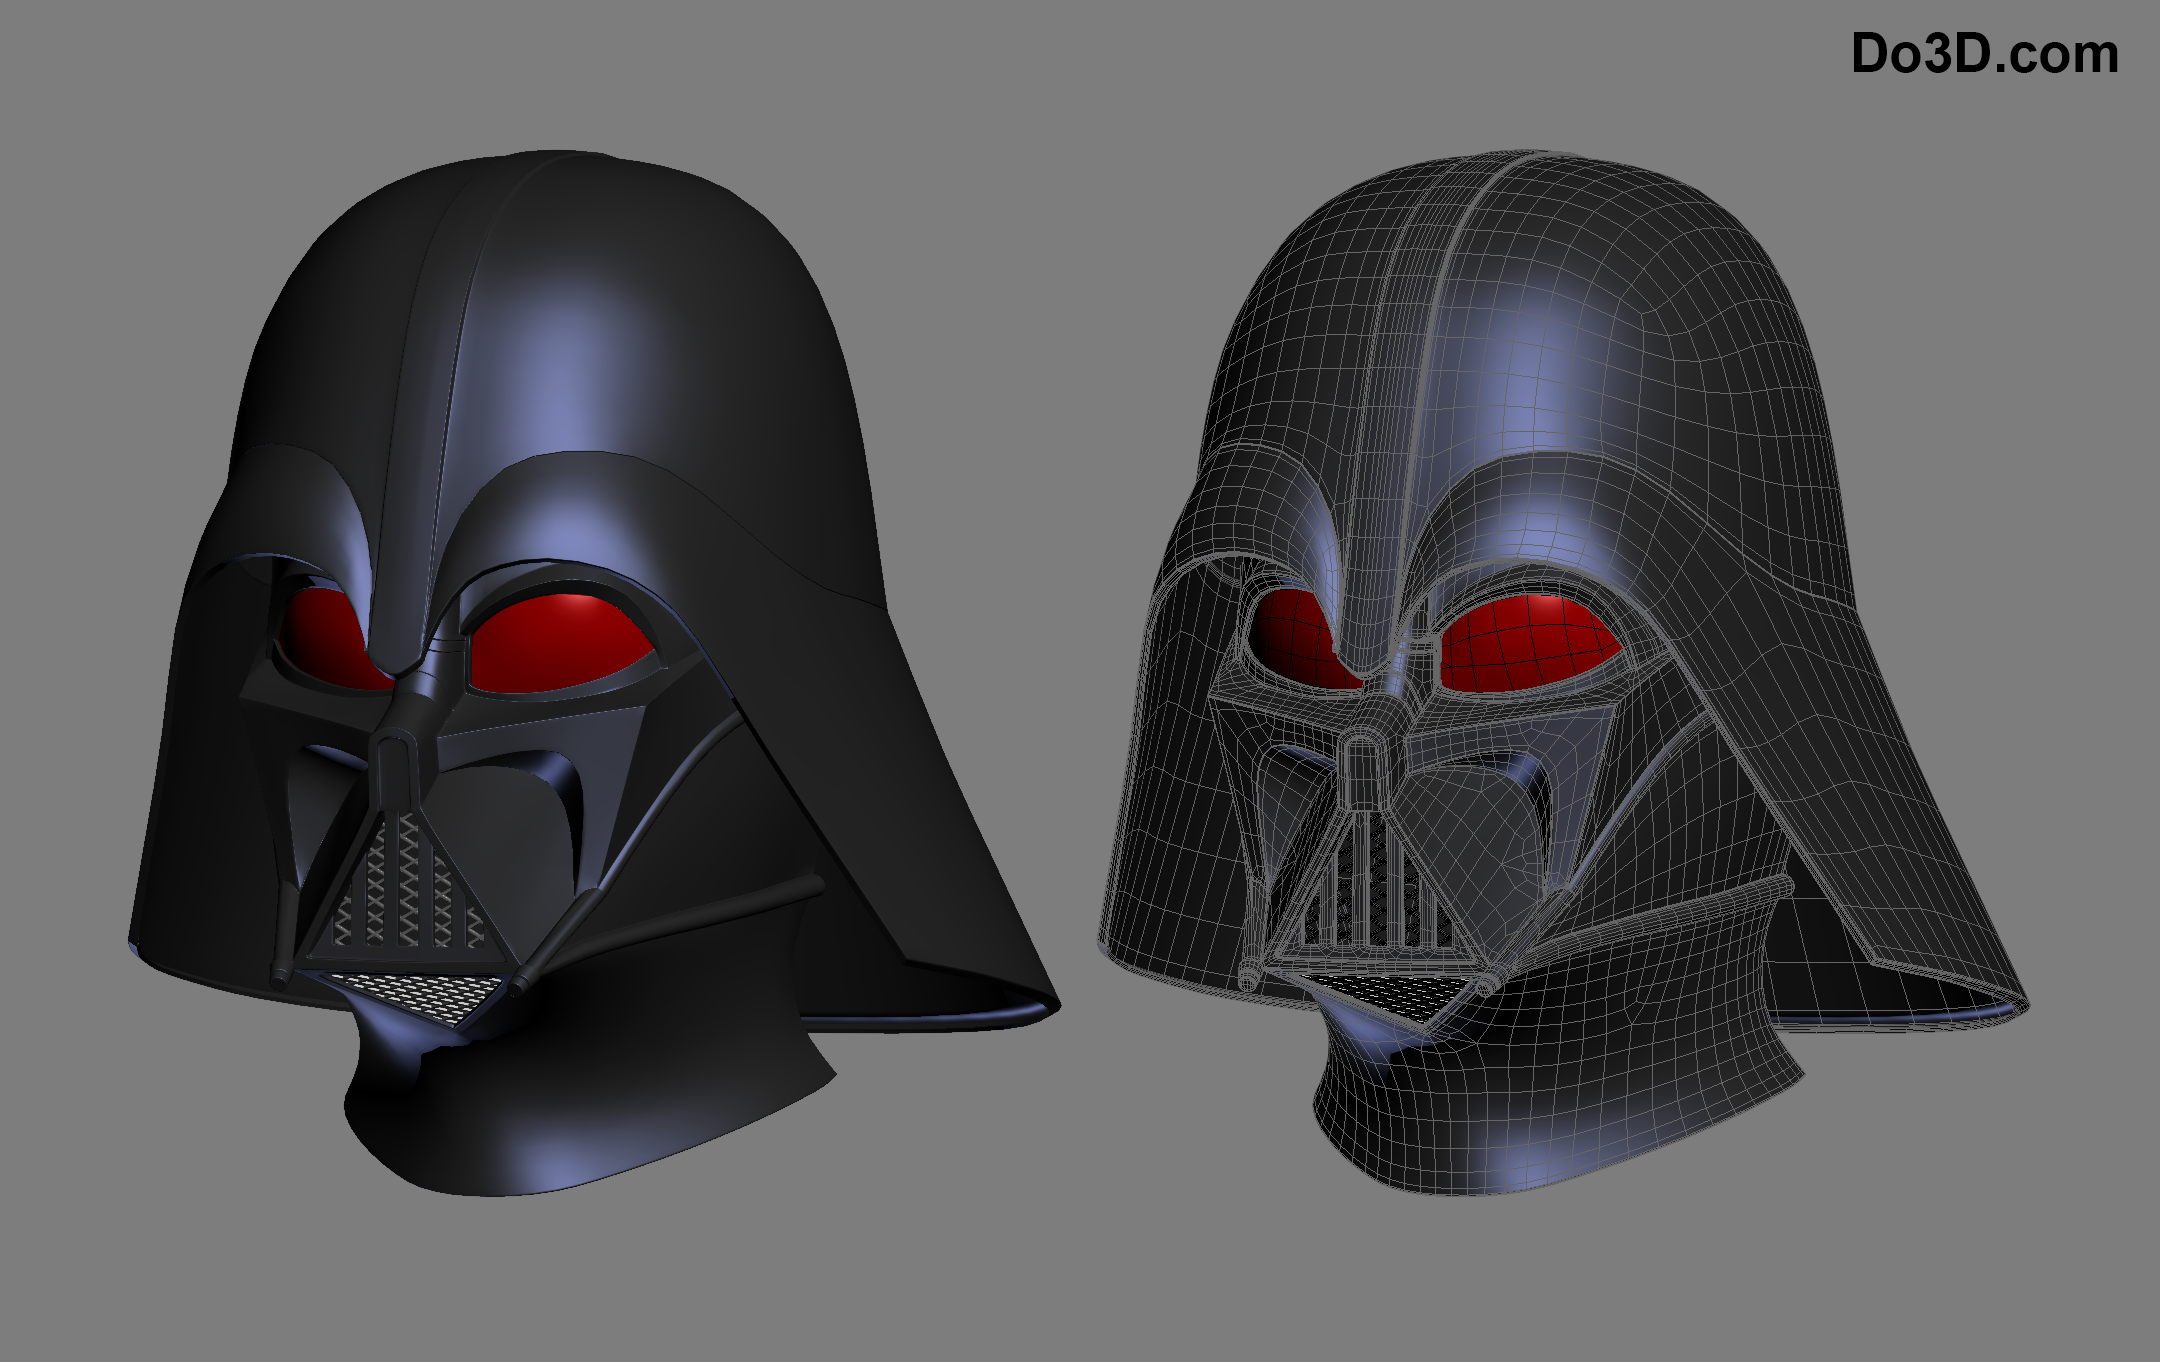 3d Printable Model Darth Vader Helmet And Body Armor Suit Star Wars